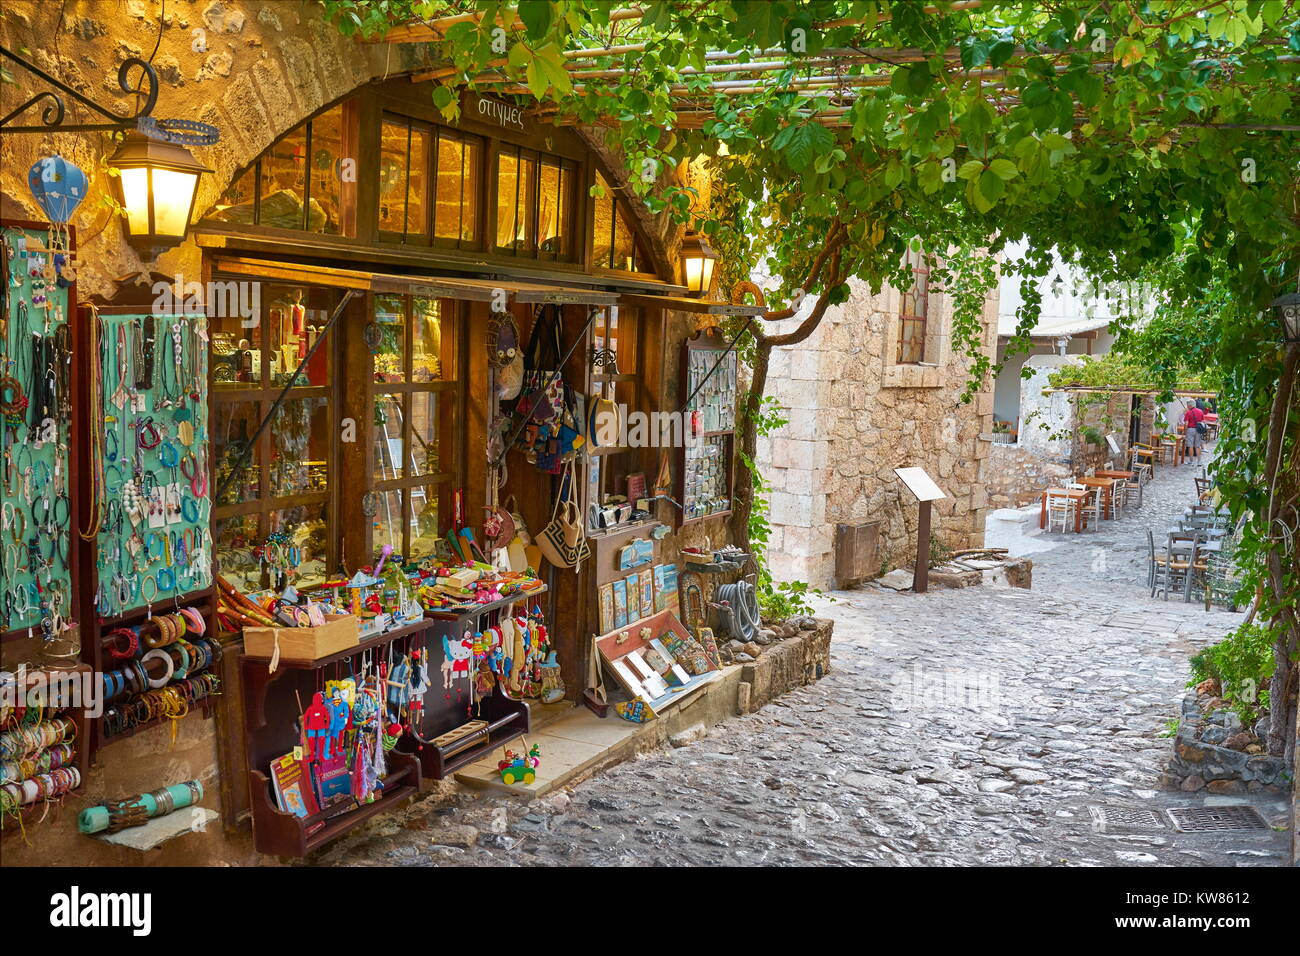 Main street in Monemvasia village, Peloponnese, Greece - Stock Image